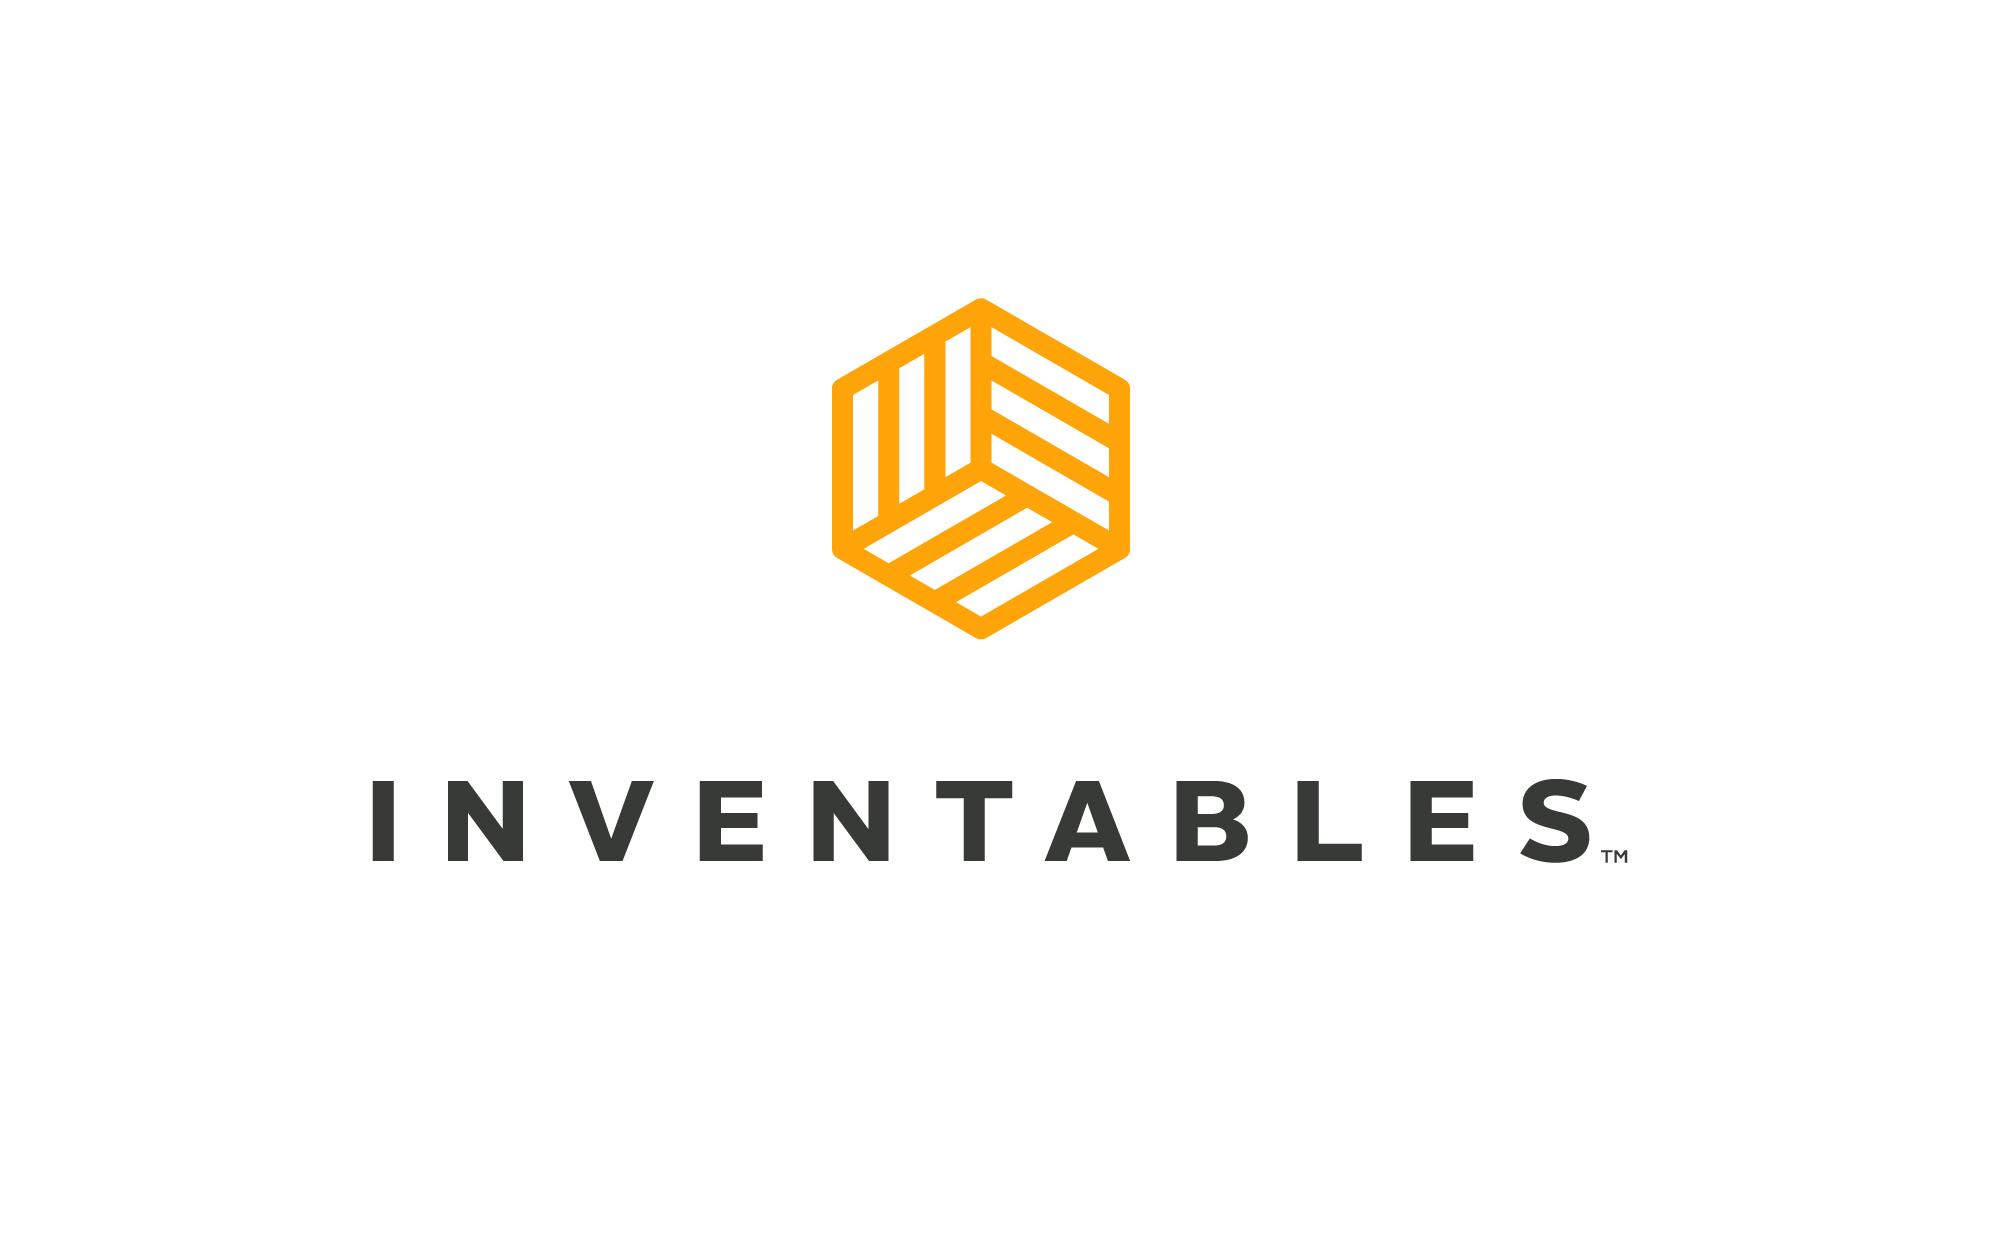 www.inventables.com